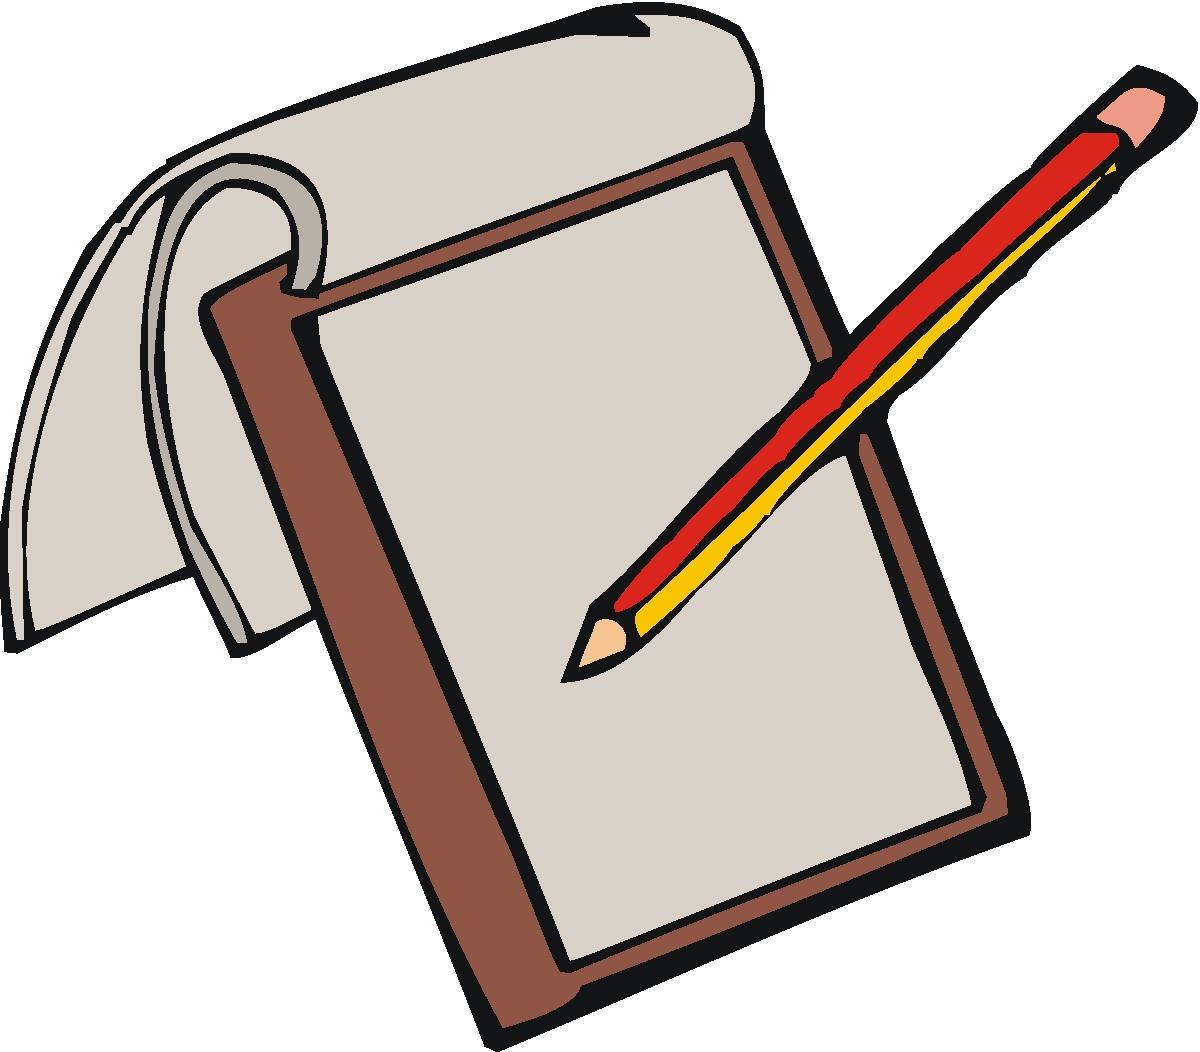 assessment clip art cliparts co Book Clip Art paper and pencil clipart